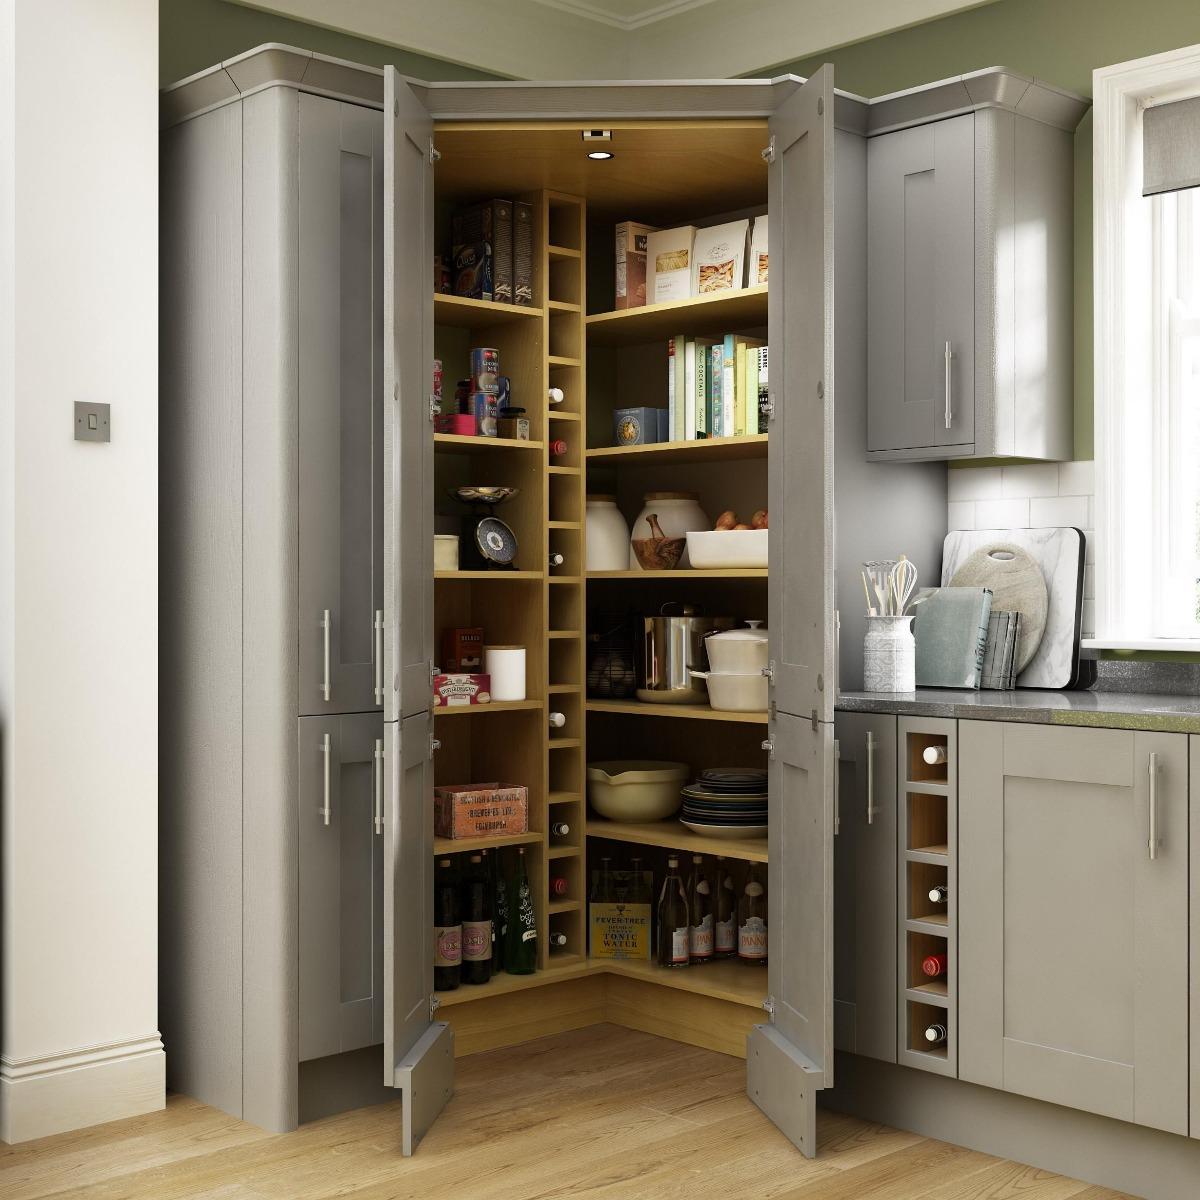 kitchen larder-stone-kitchen